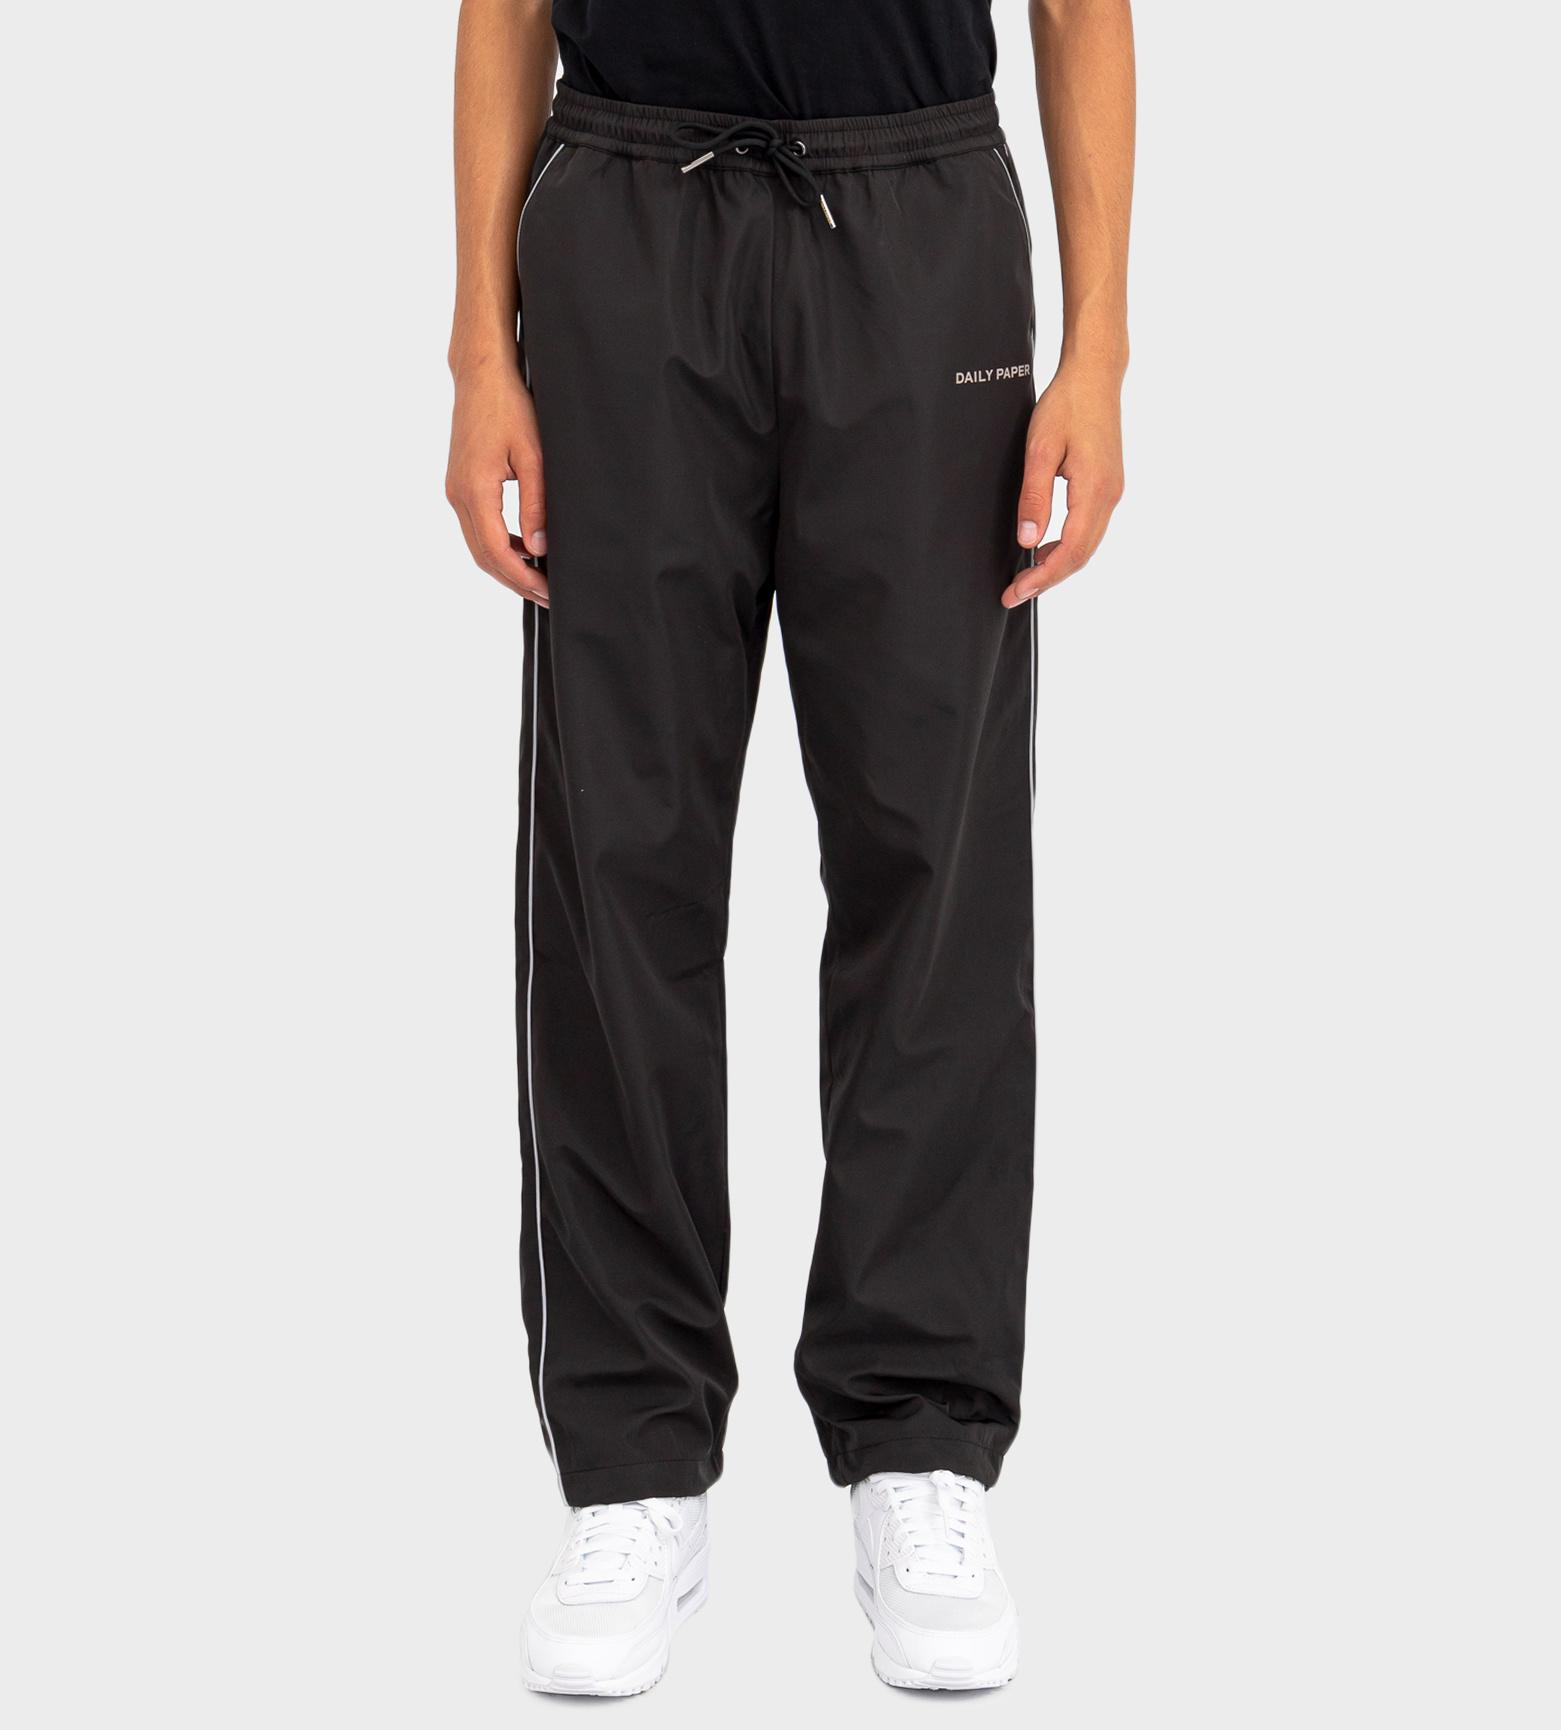 DAILY PAPER Etrack Pants Black